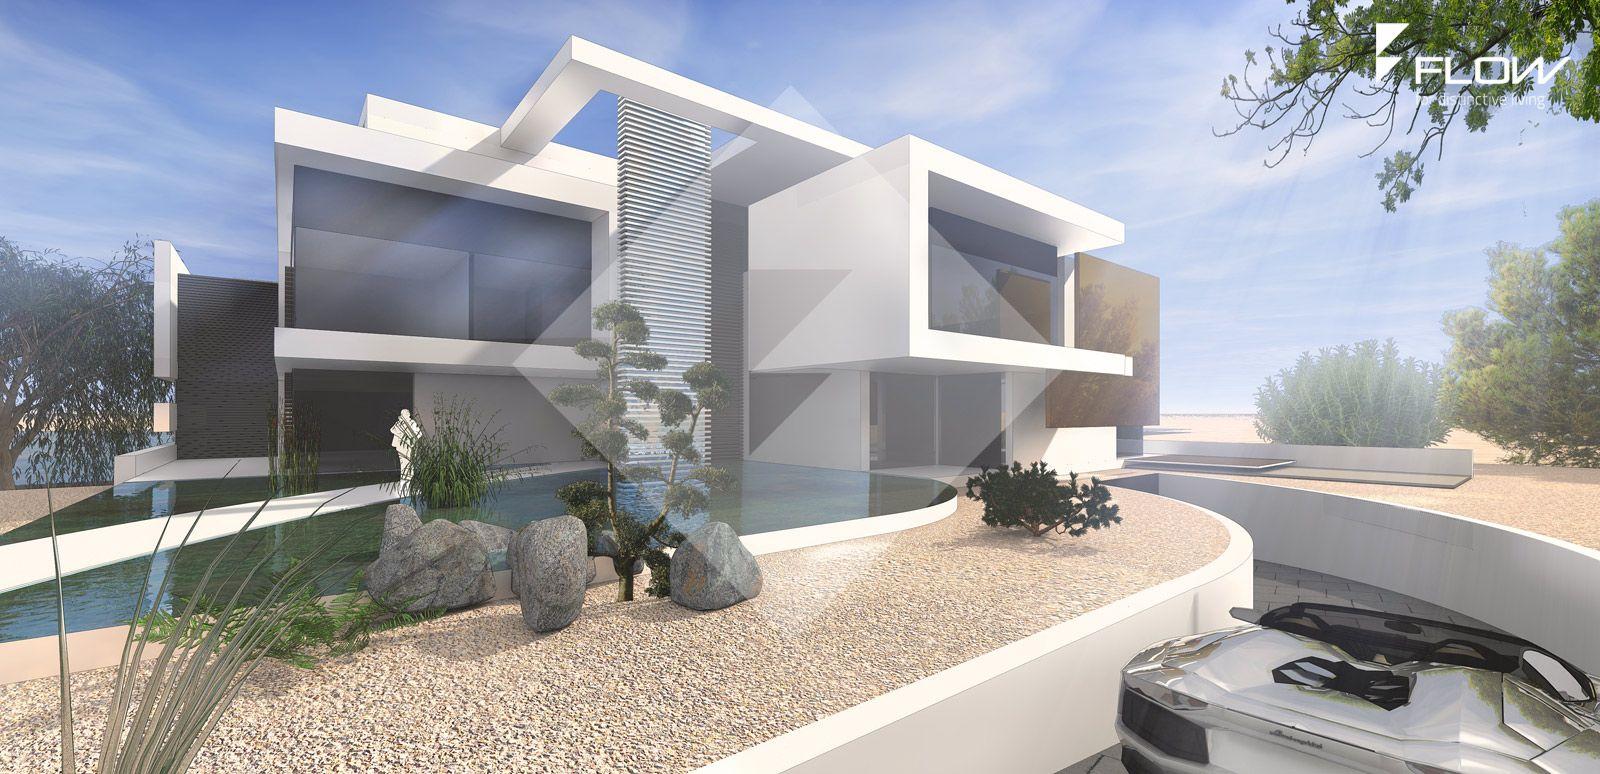 Mehrfamilienhaus entwurf in moderner architektur design for Mehrfamilienhaus modern